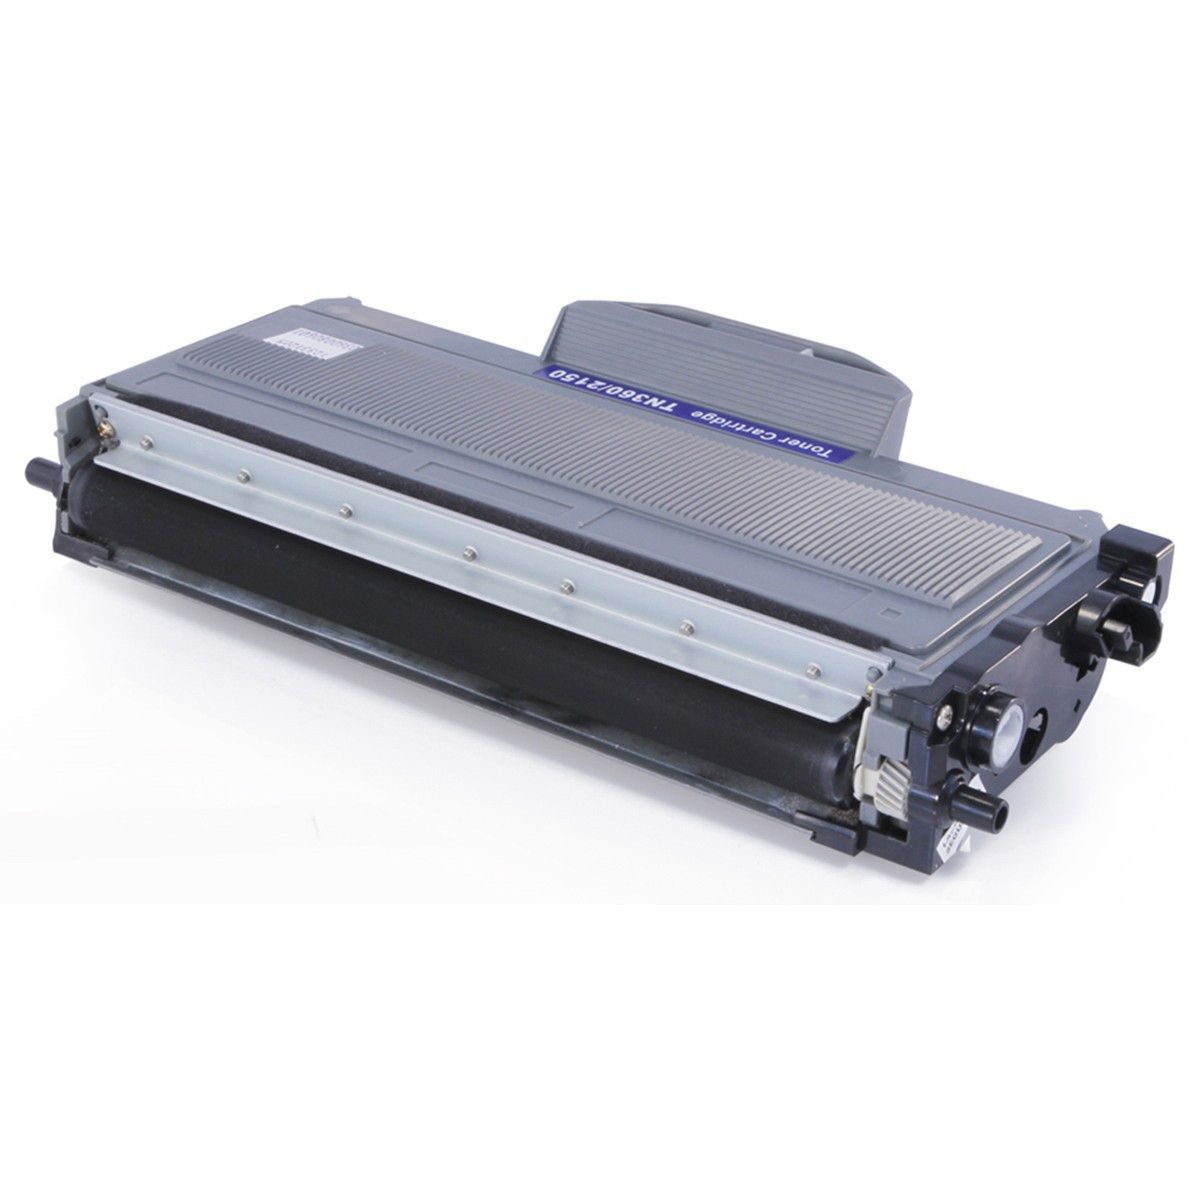 Compatível: Toner TN360 TN2120 para Brother DCP7030 DCP7040 HL2140 HL2150 2150n 2170w 7320 7440 7840 / Preto / 2.600